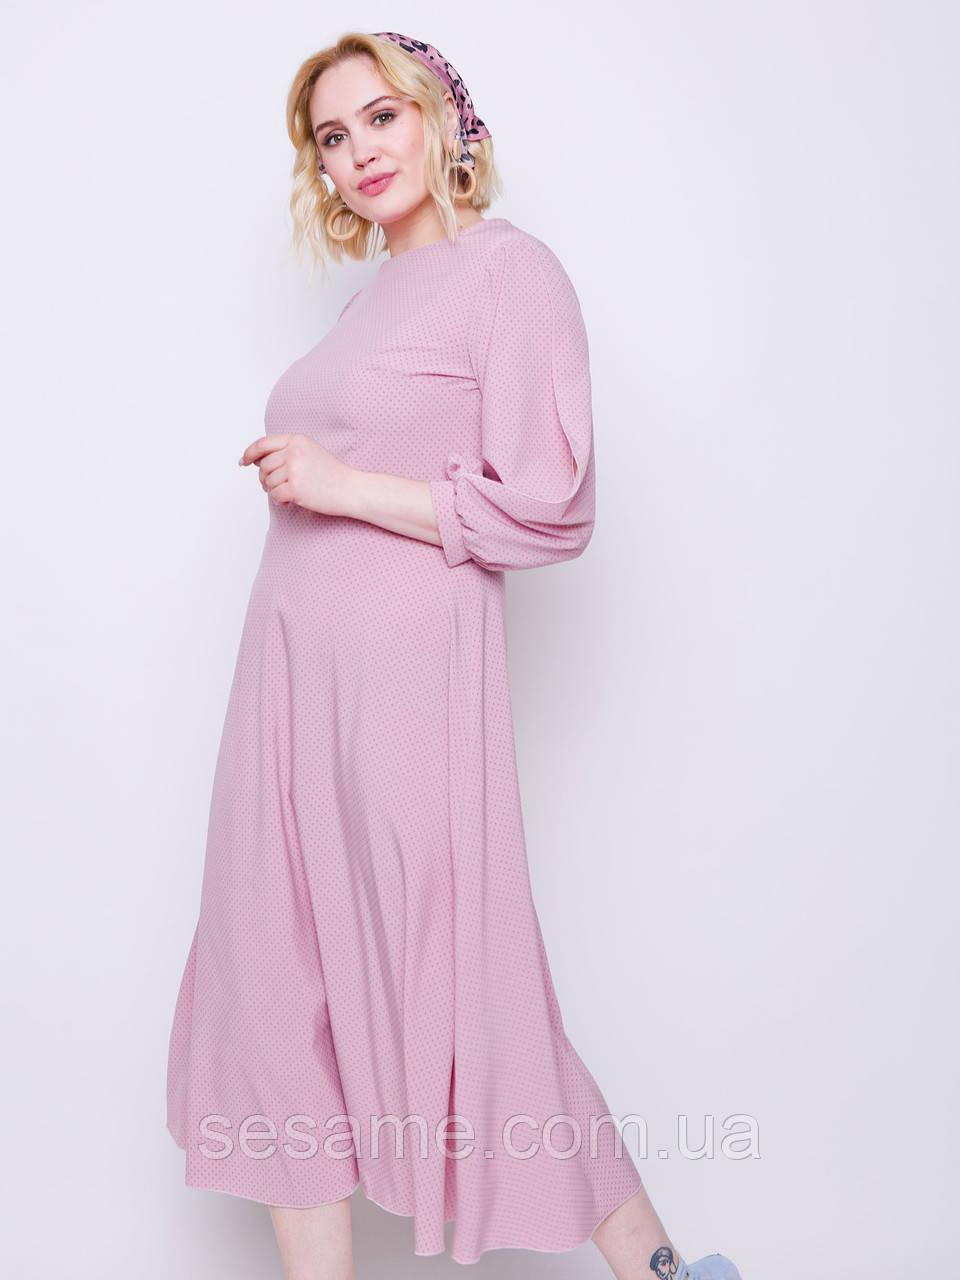 grand ua Камилла принт платье